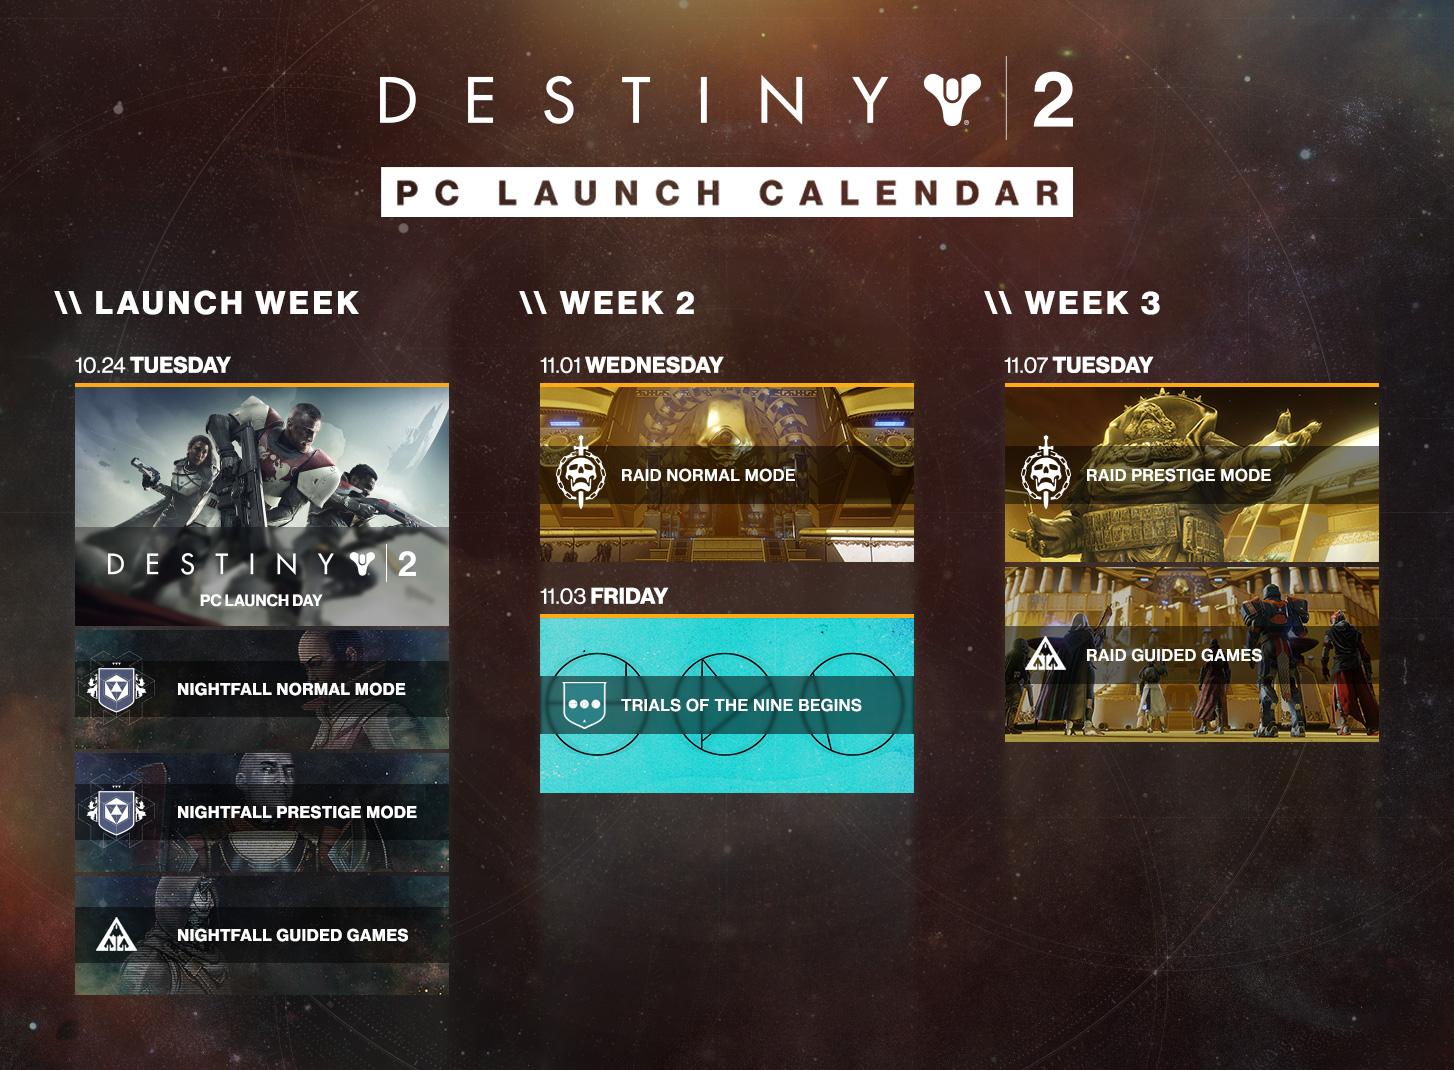 Orv posted Destiny 2 PCFashion Thread Purse